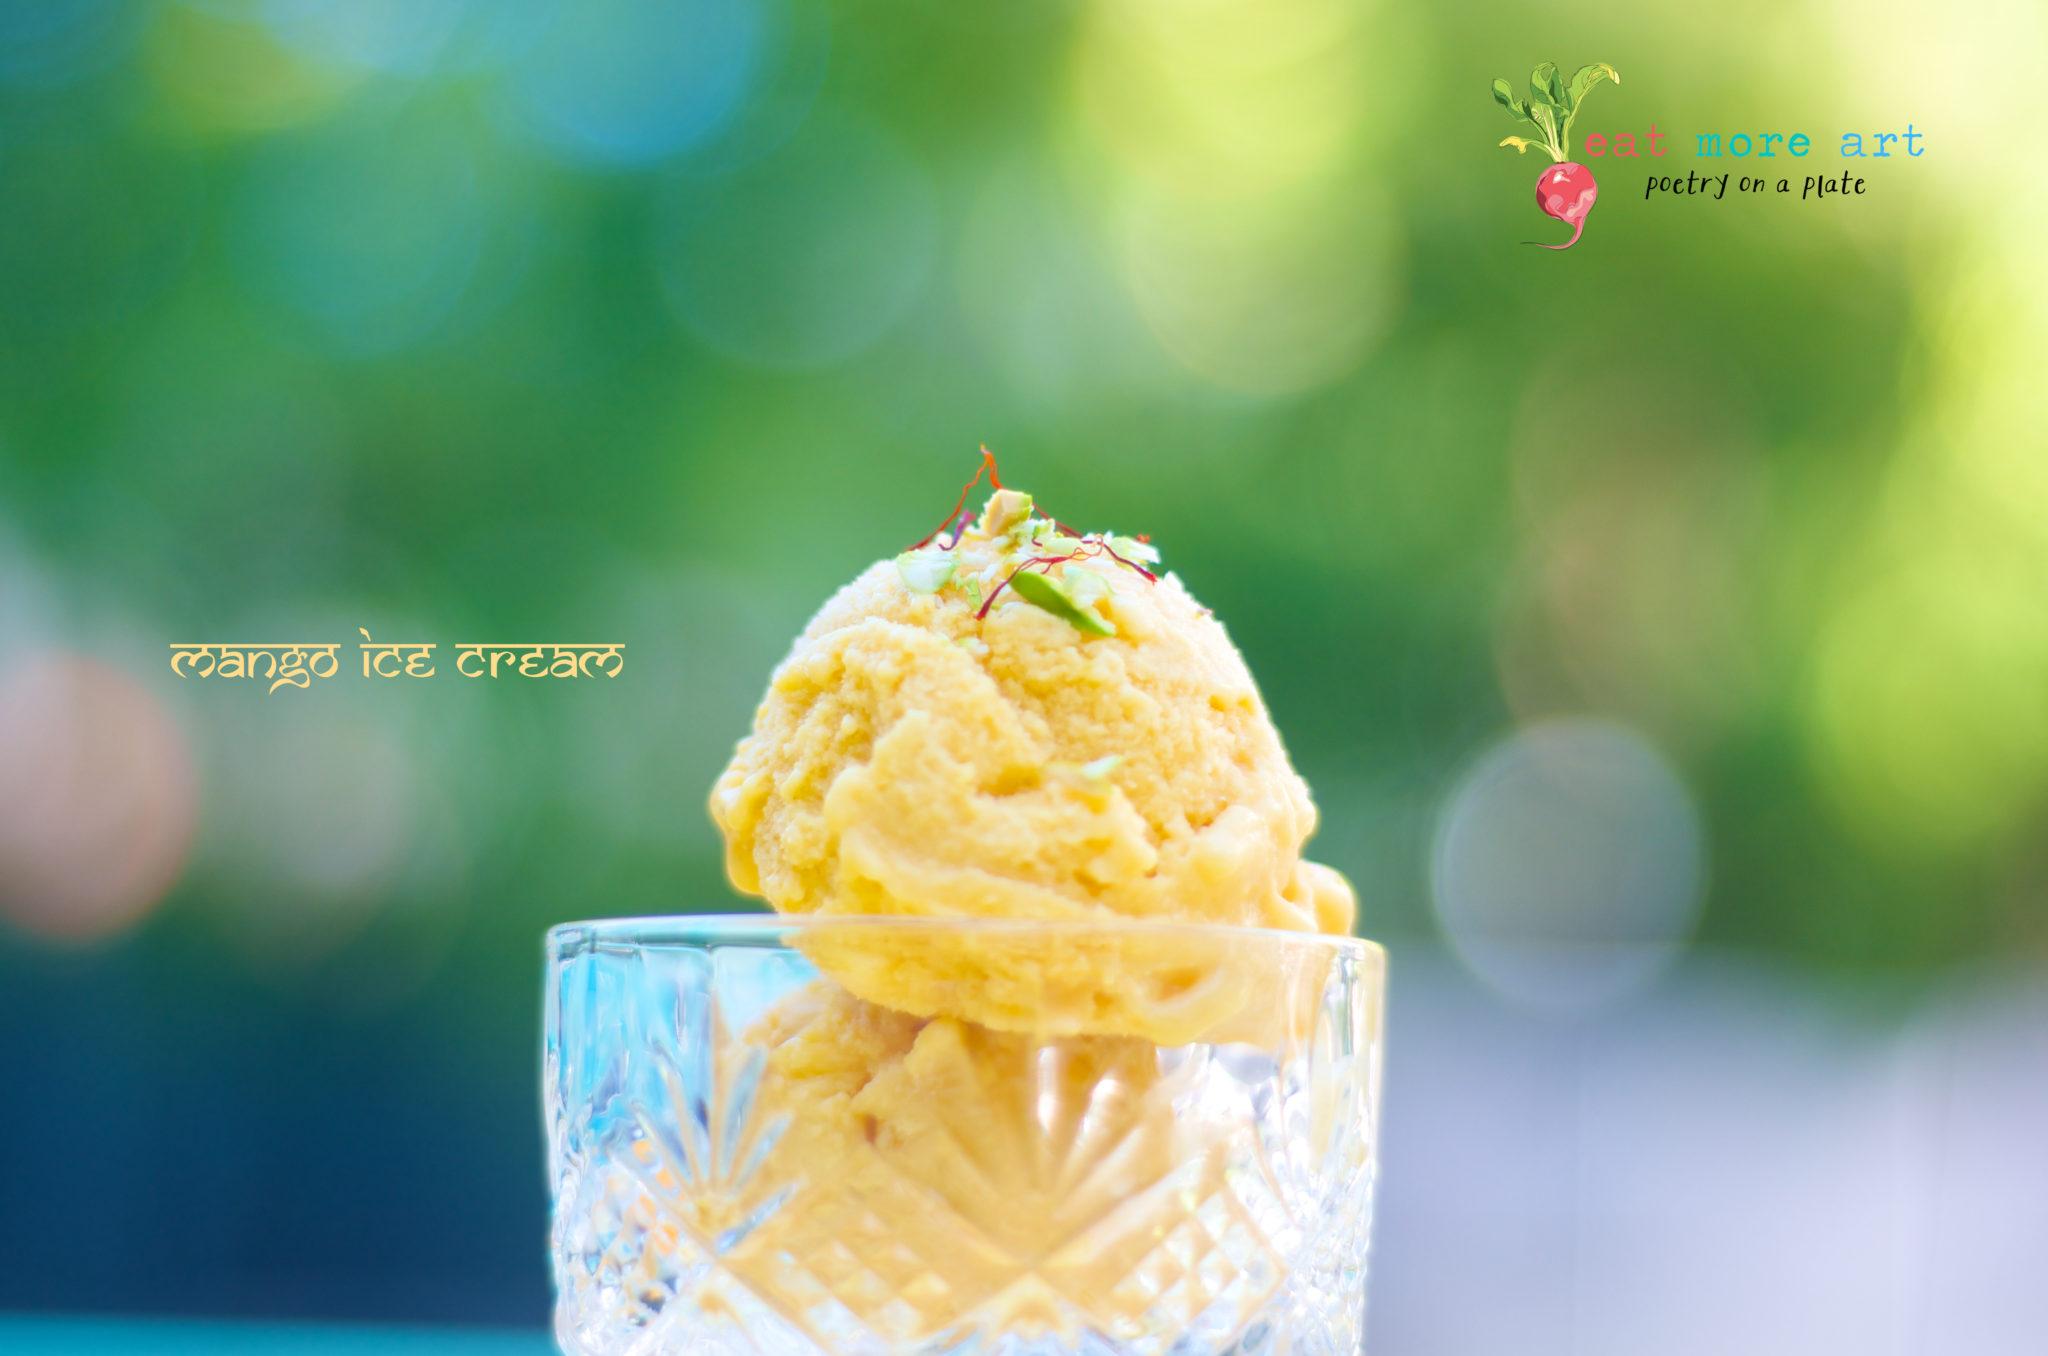 Mango Ice Cream 5 - Eat More Art - Logo